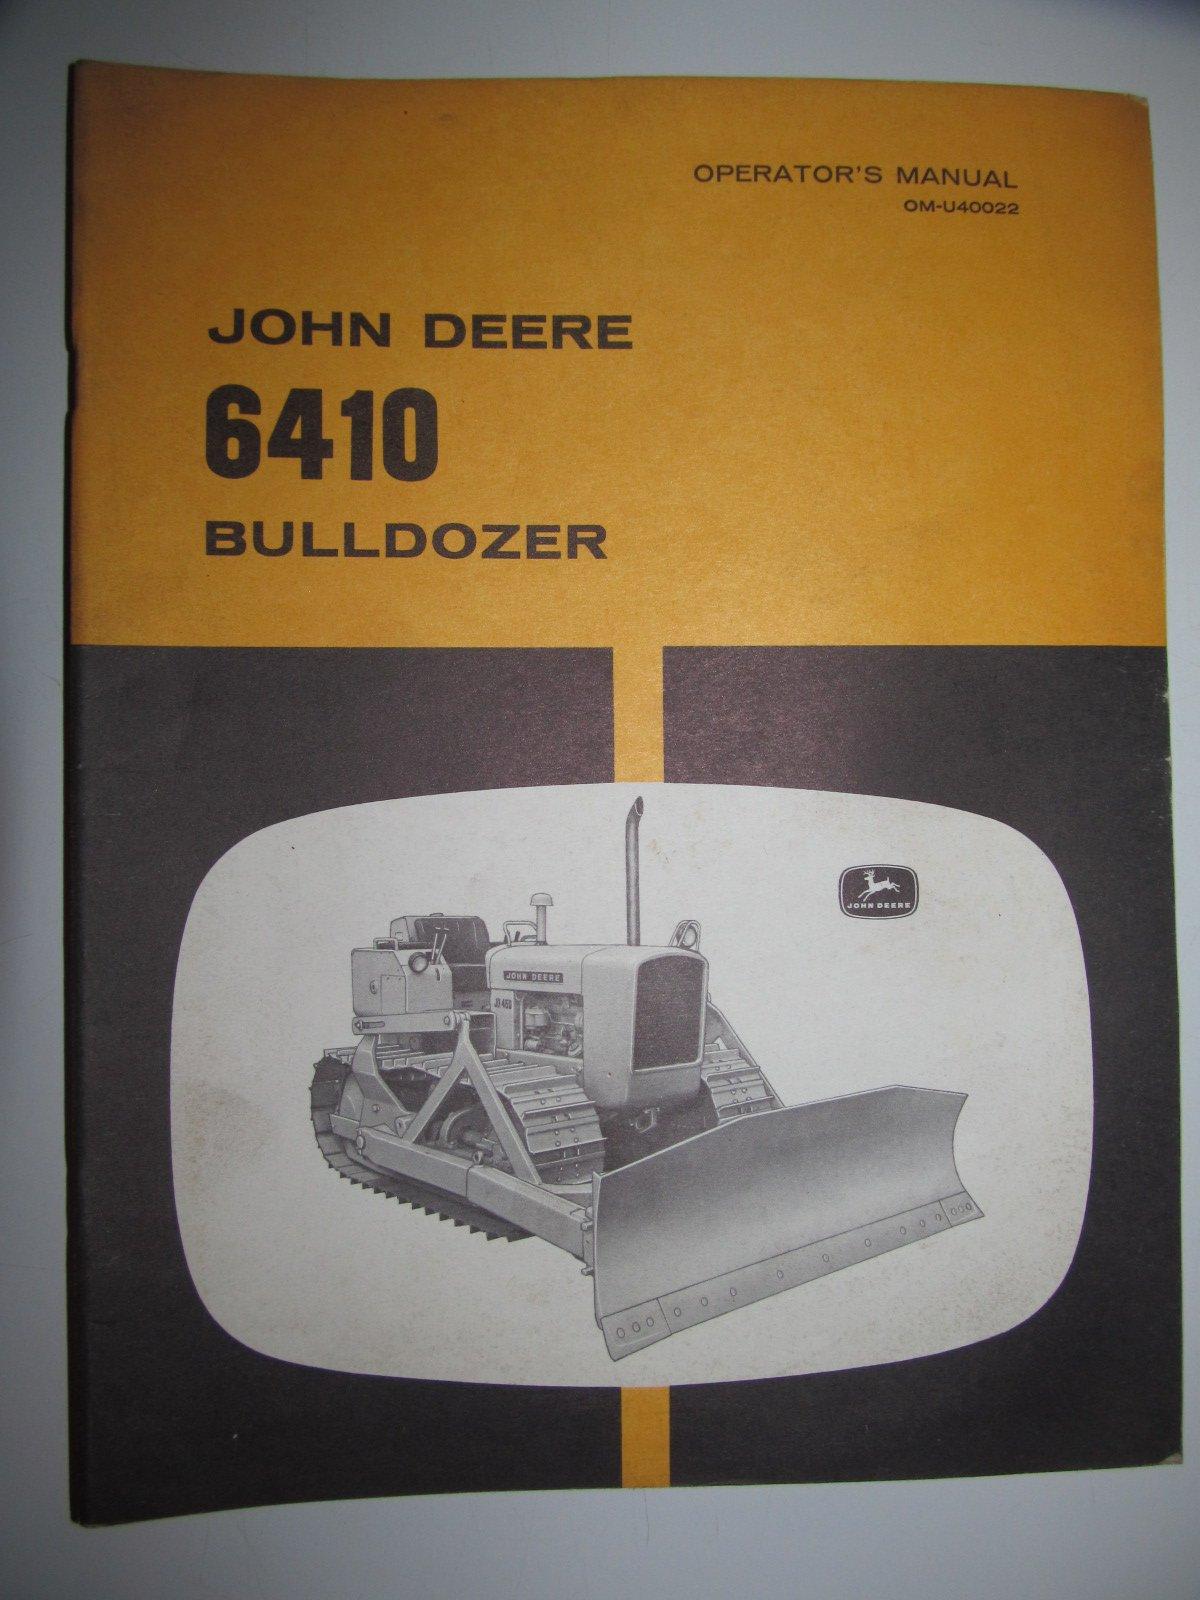 John Deere 6410 Bulldozer Operators Owners Manual Original OM-U40022: John  Deere: Amazon.com: Books